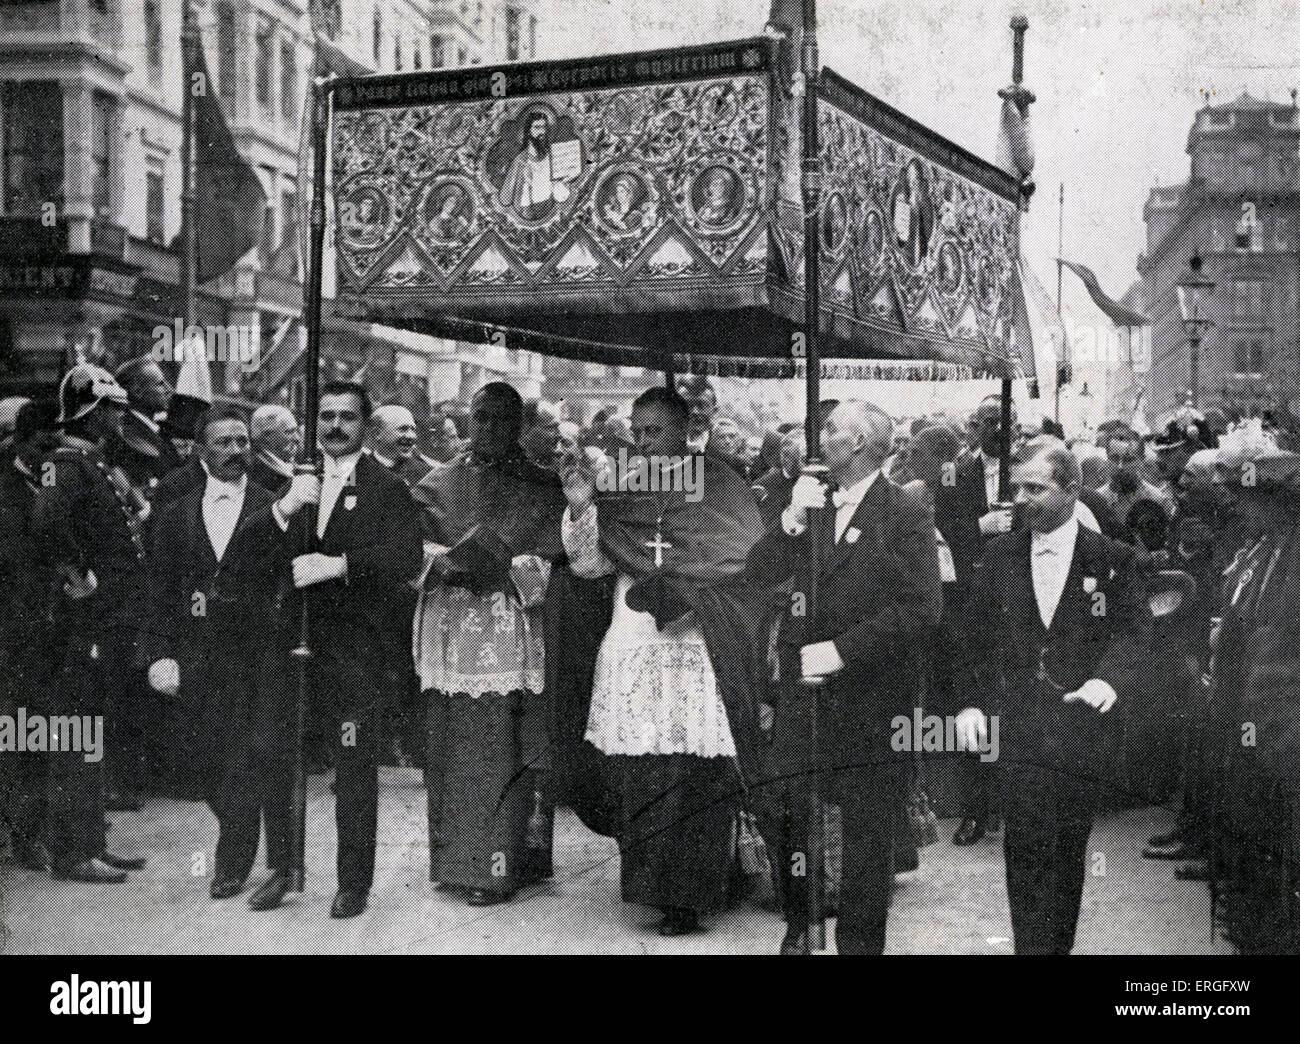 Eucharist Congress, Vienna, 1912. Shown: Papal legate van Rossum. International Catholic gathering. - Stock Image